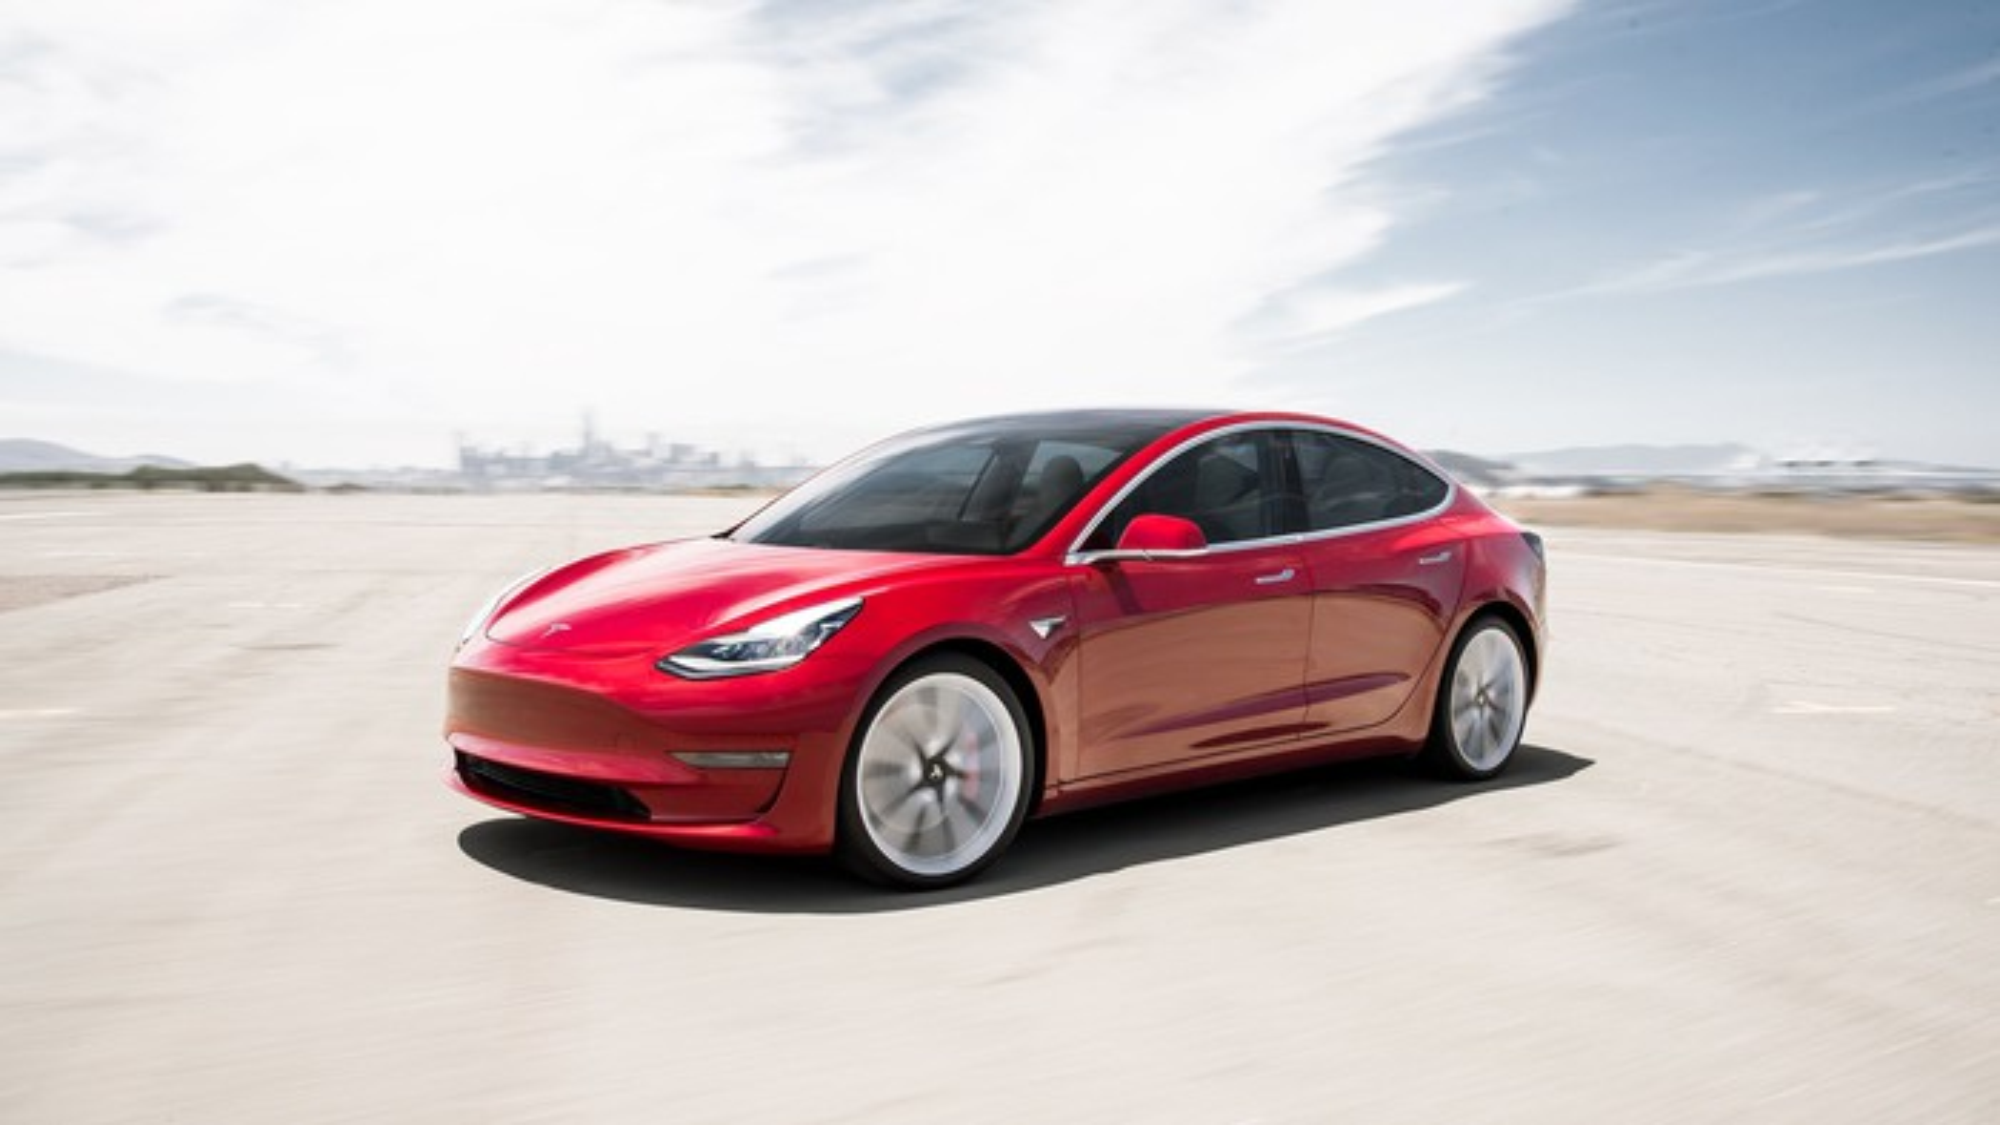 A red Tesla Model 3 in a desert setting